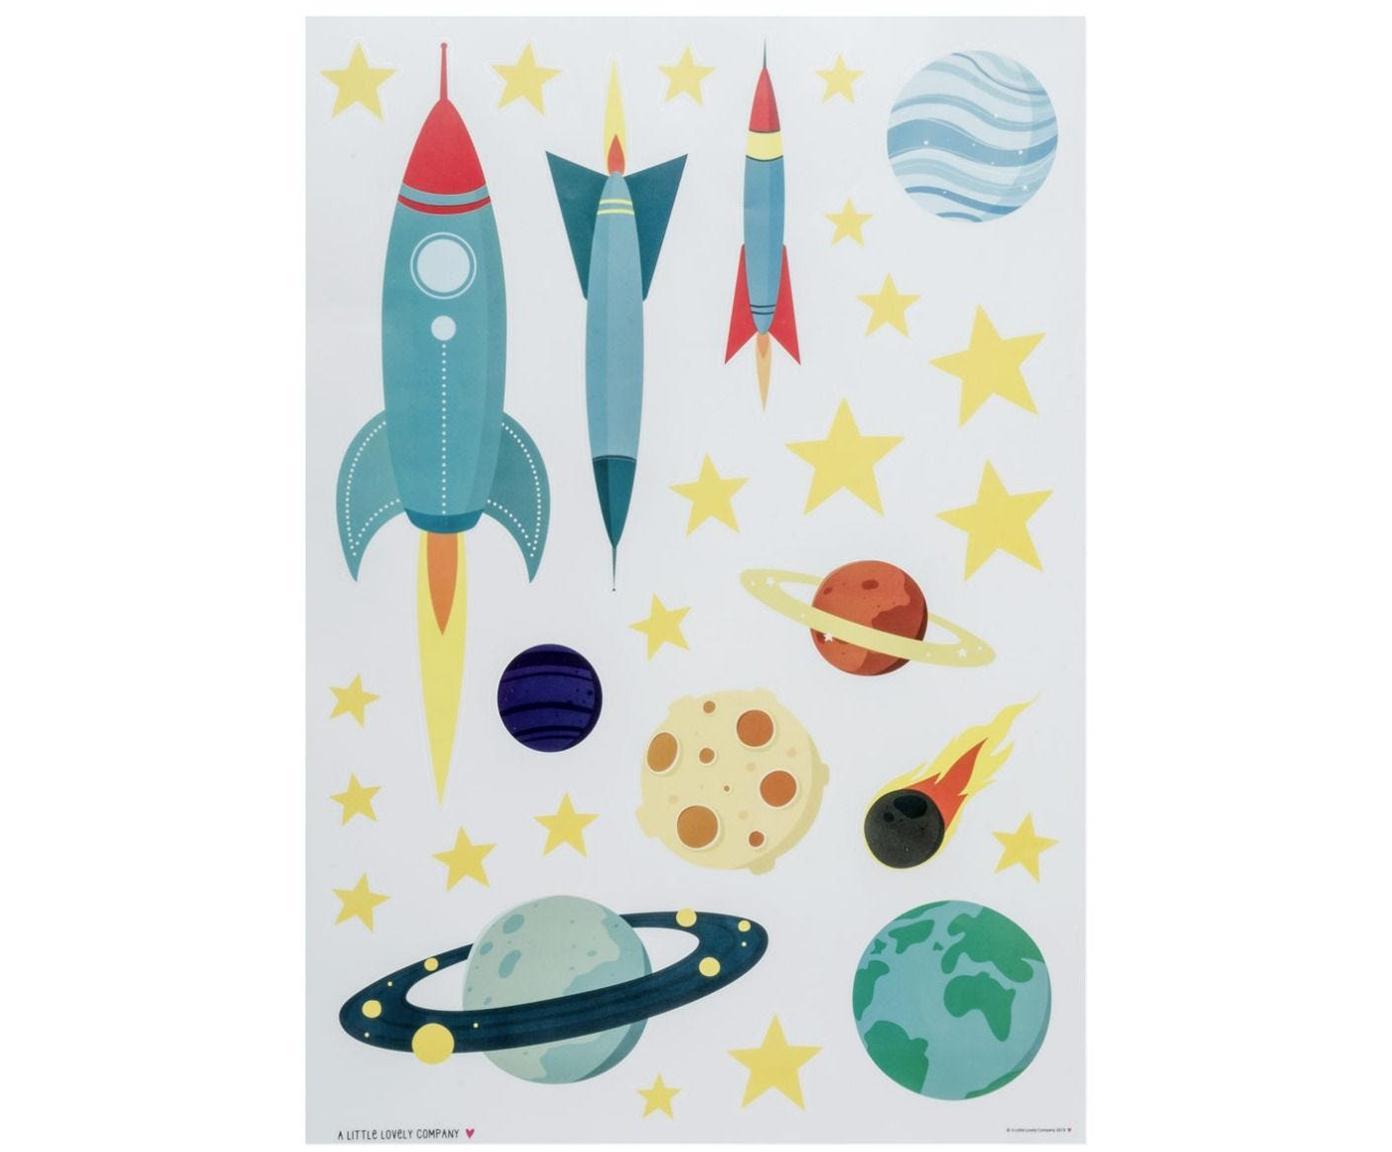 Set adesivi murali Space, 29 pz. , Materiale sintetico, Multicolore, Larg. 35 x Alt. 50 cm